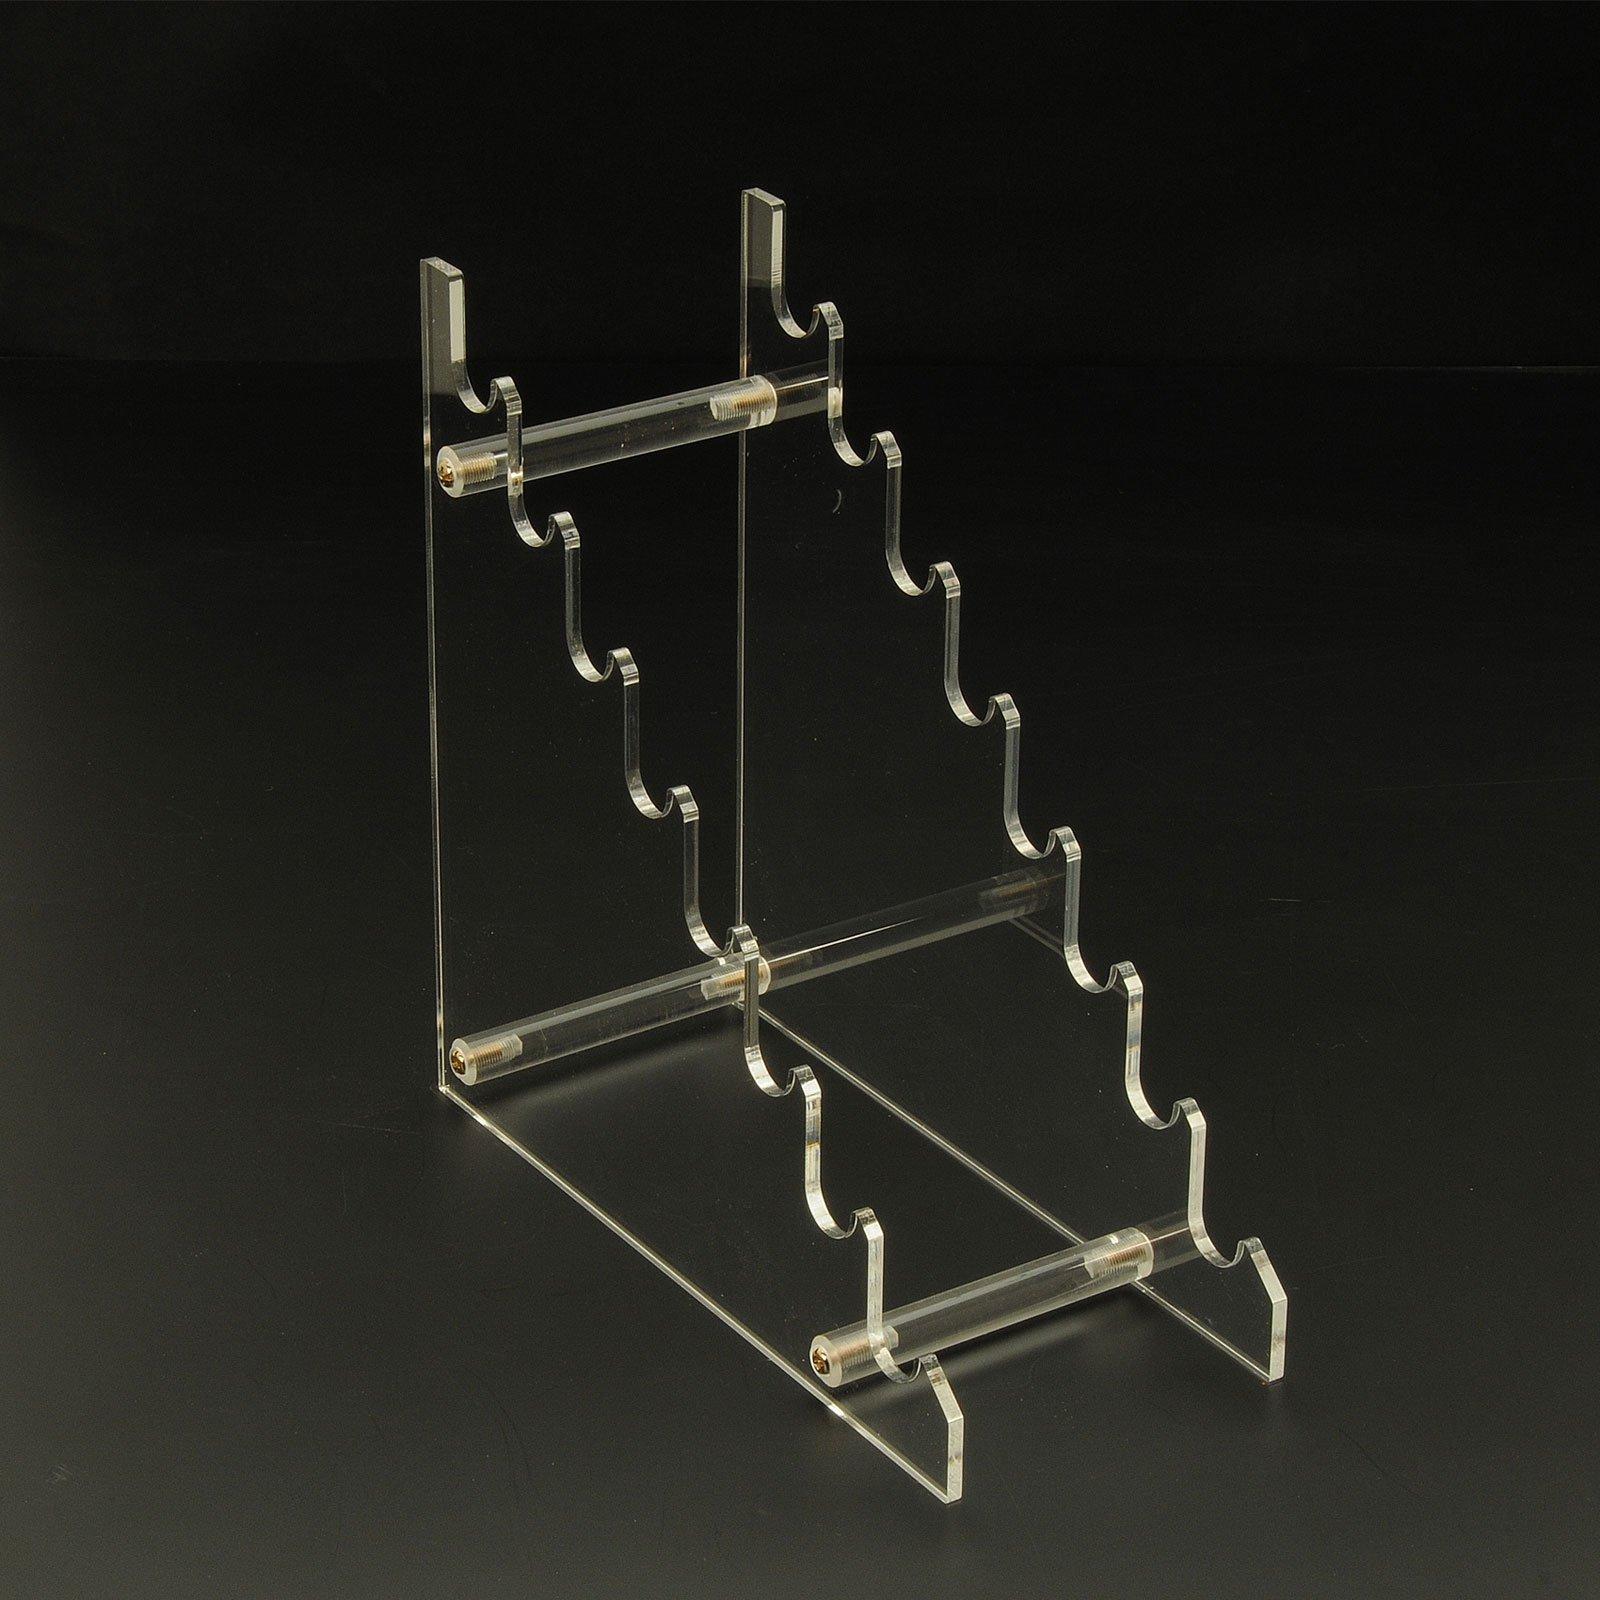 Acrylic Stand Designs : Pen horizontal premium acrylic display stand at penn